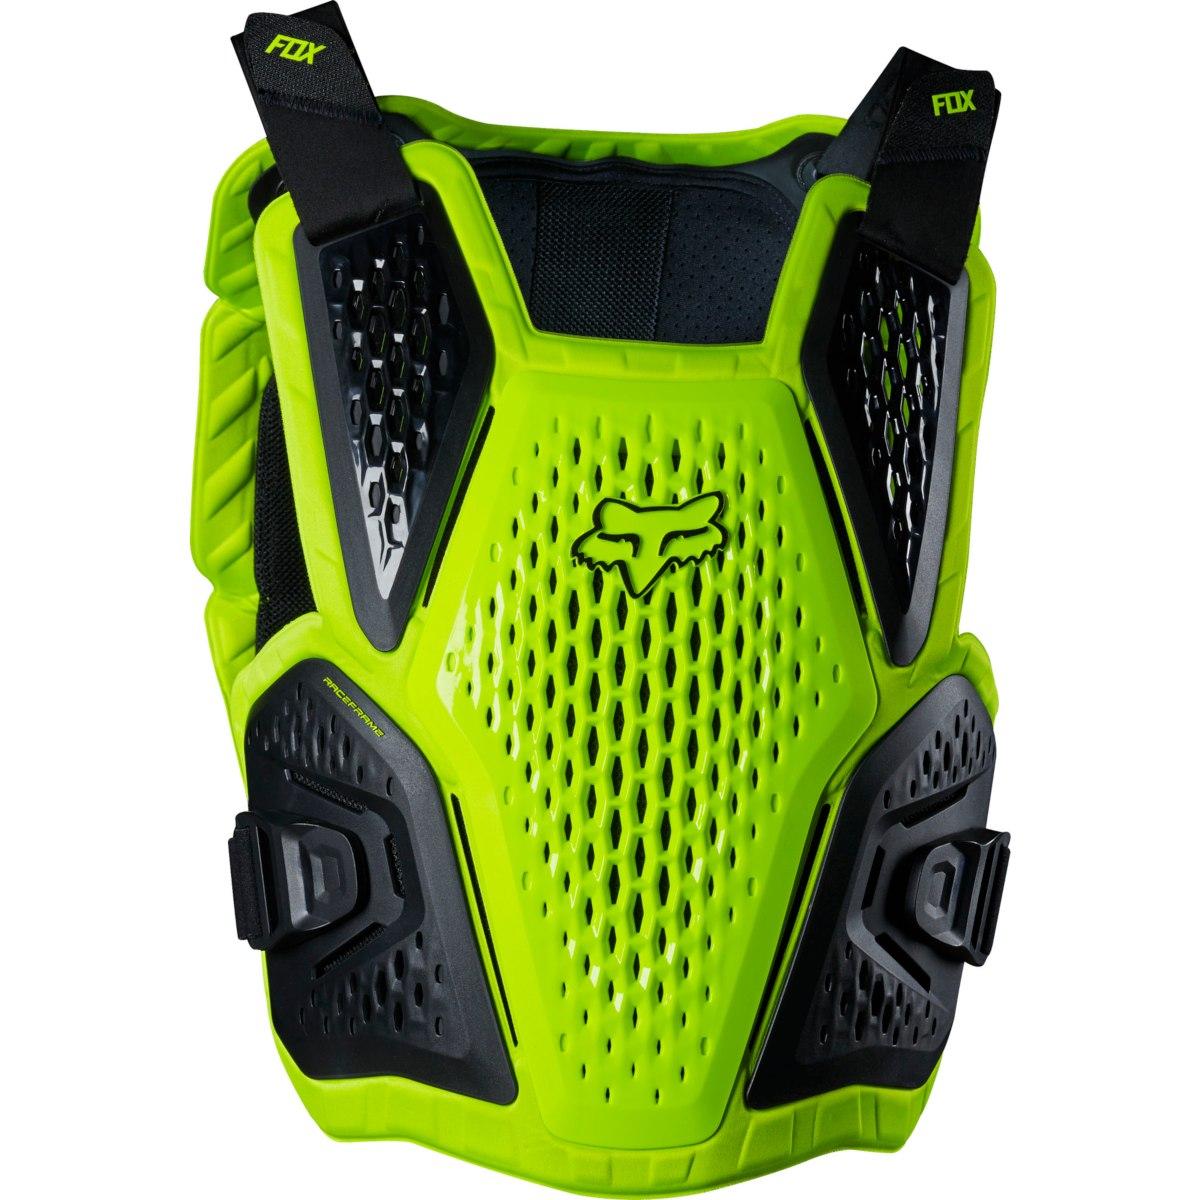 FOX Raceframe Impact CE Protector - flo yellow